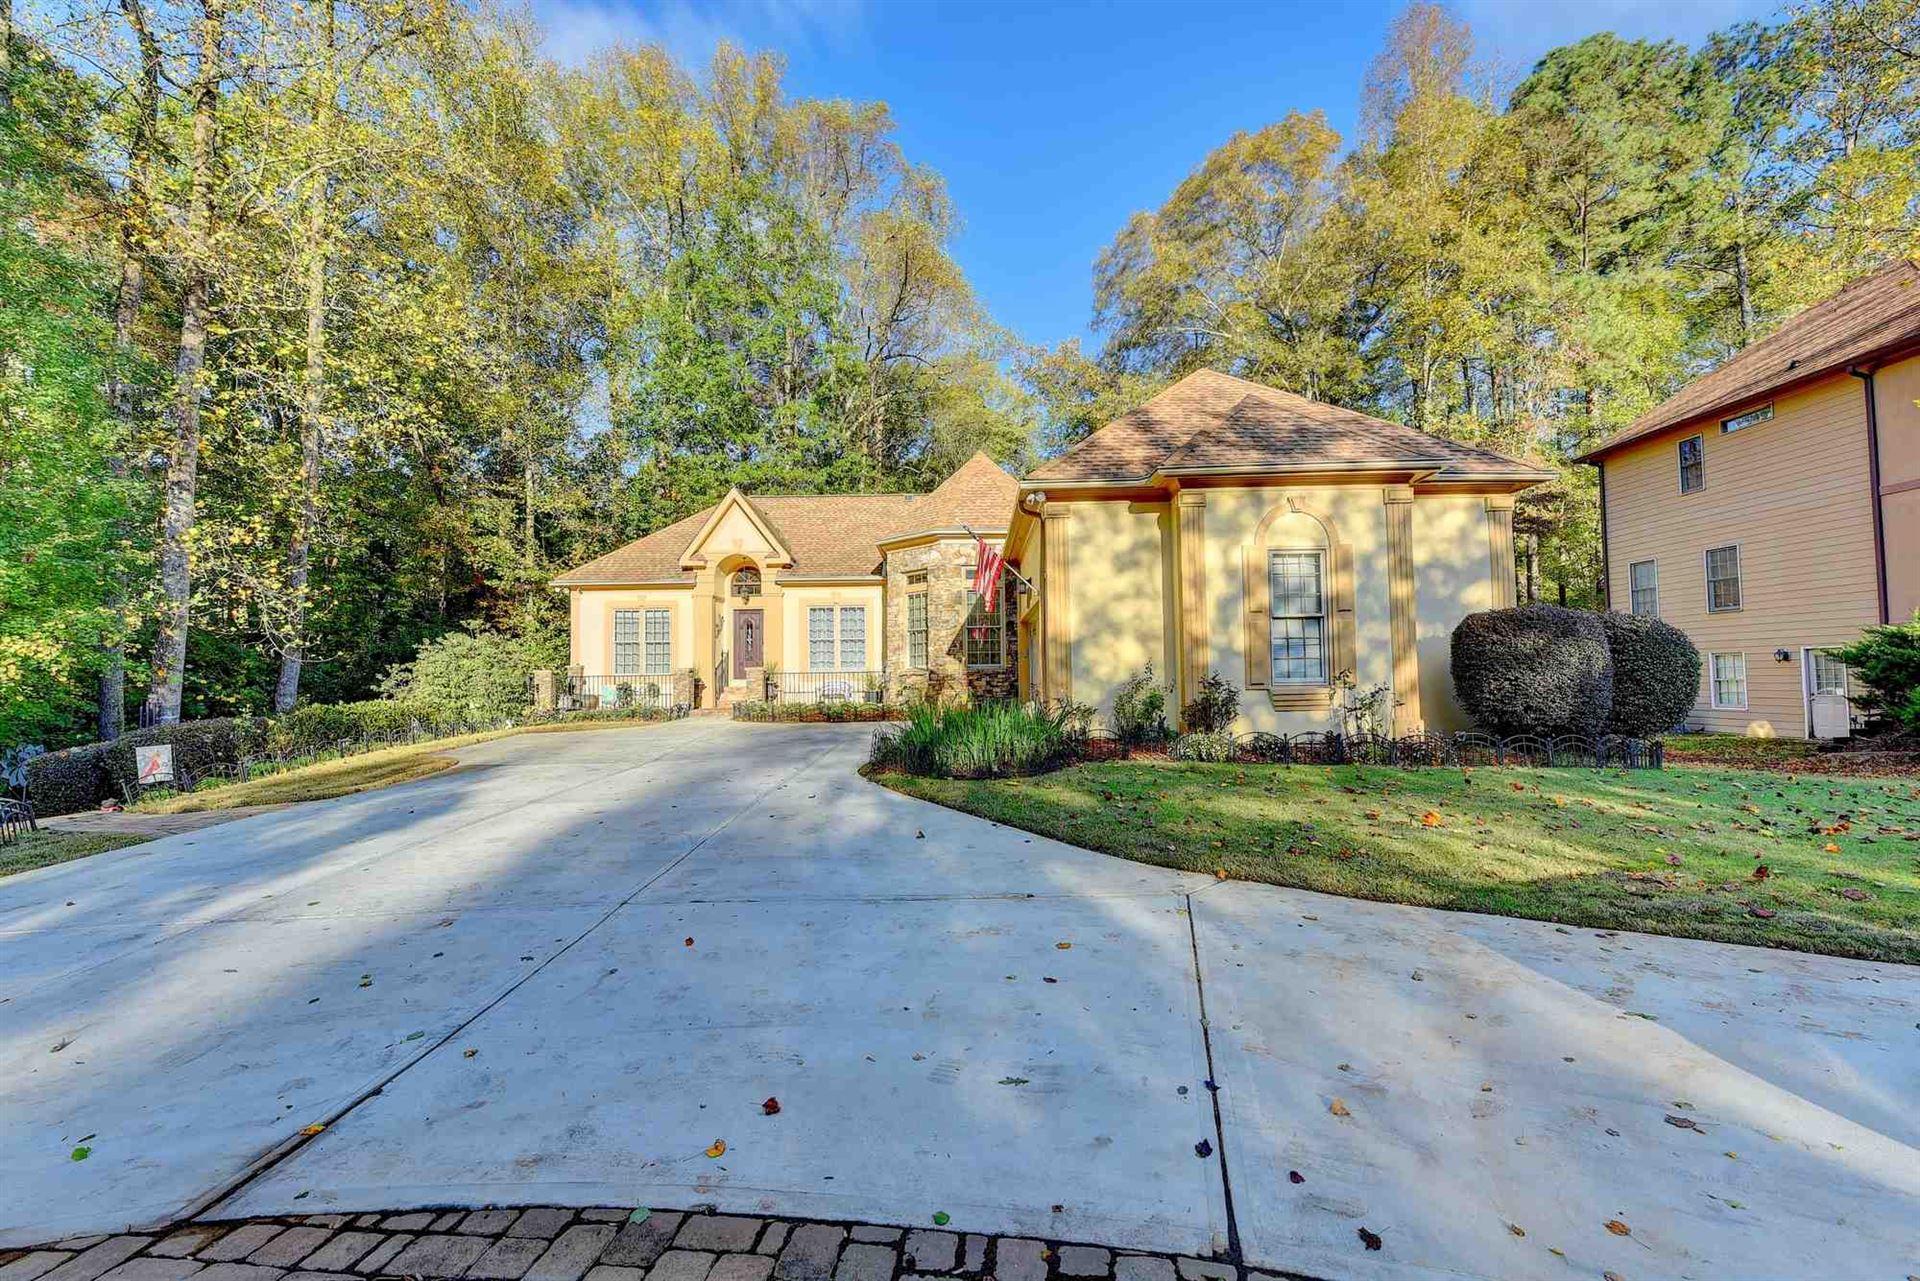 1730 Laurel Creek, Lawrenceville, GA 30043 - #: 8882402